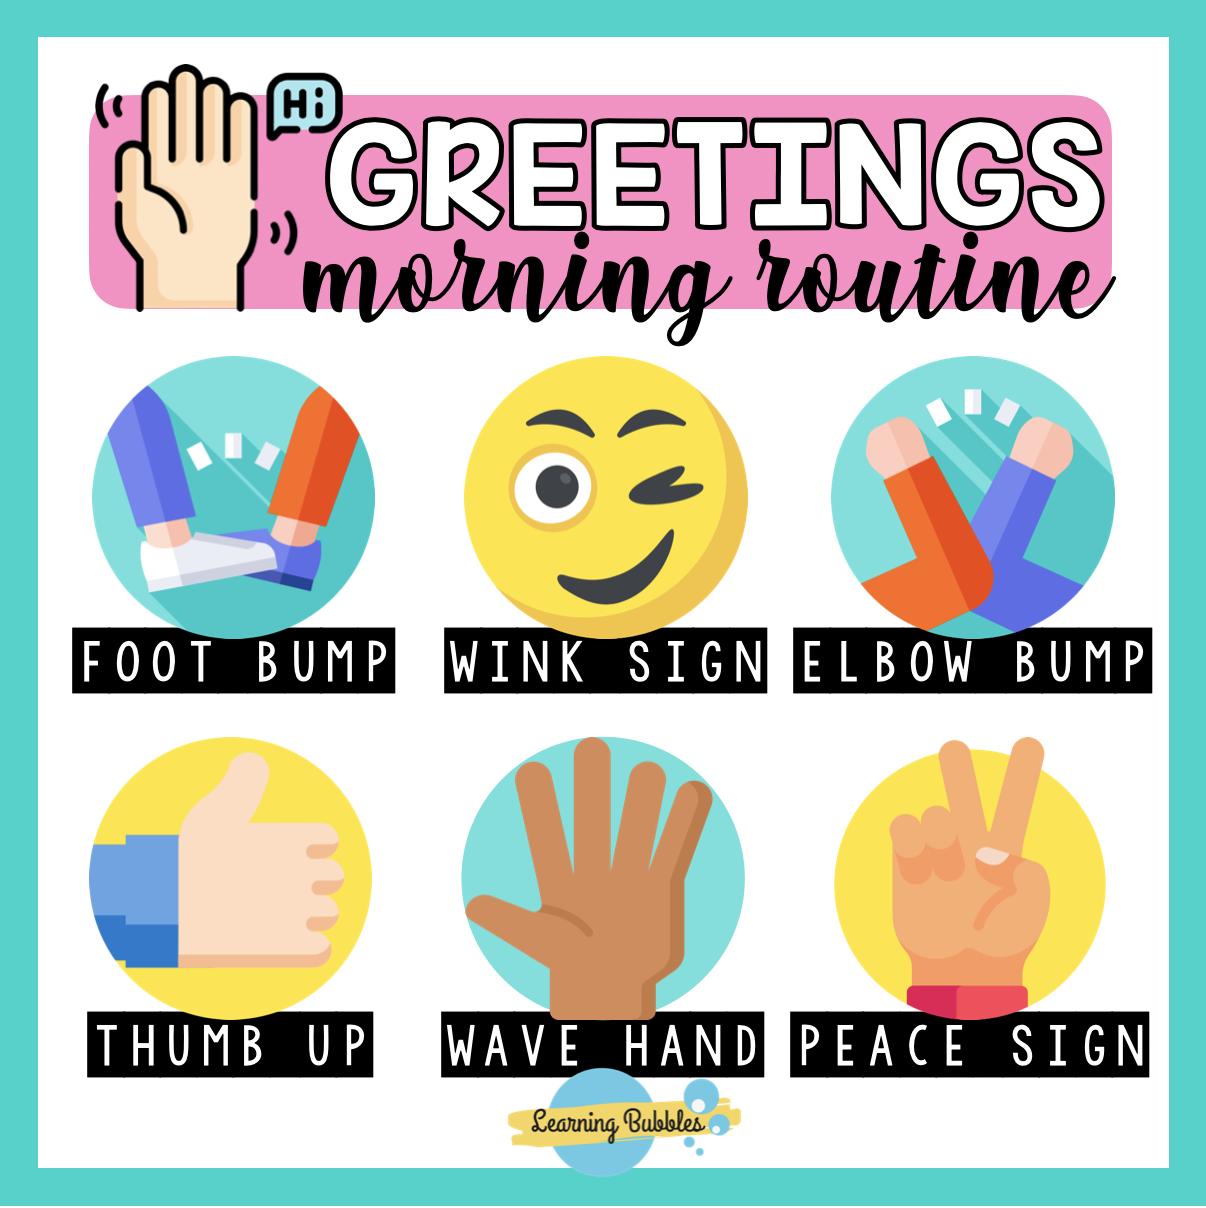 NEW MORNING GREETINGS